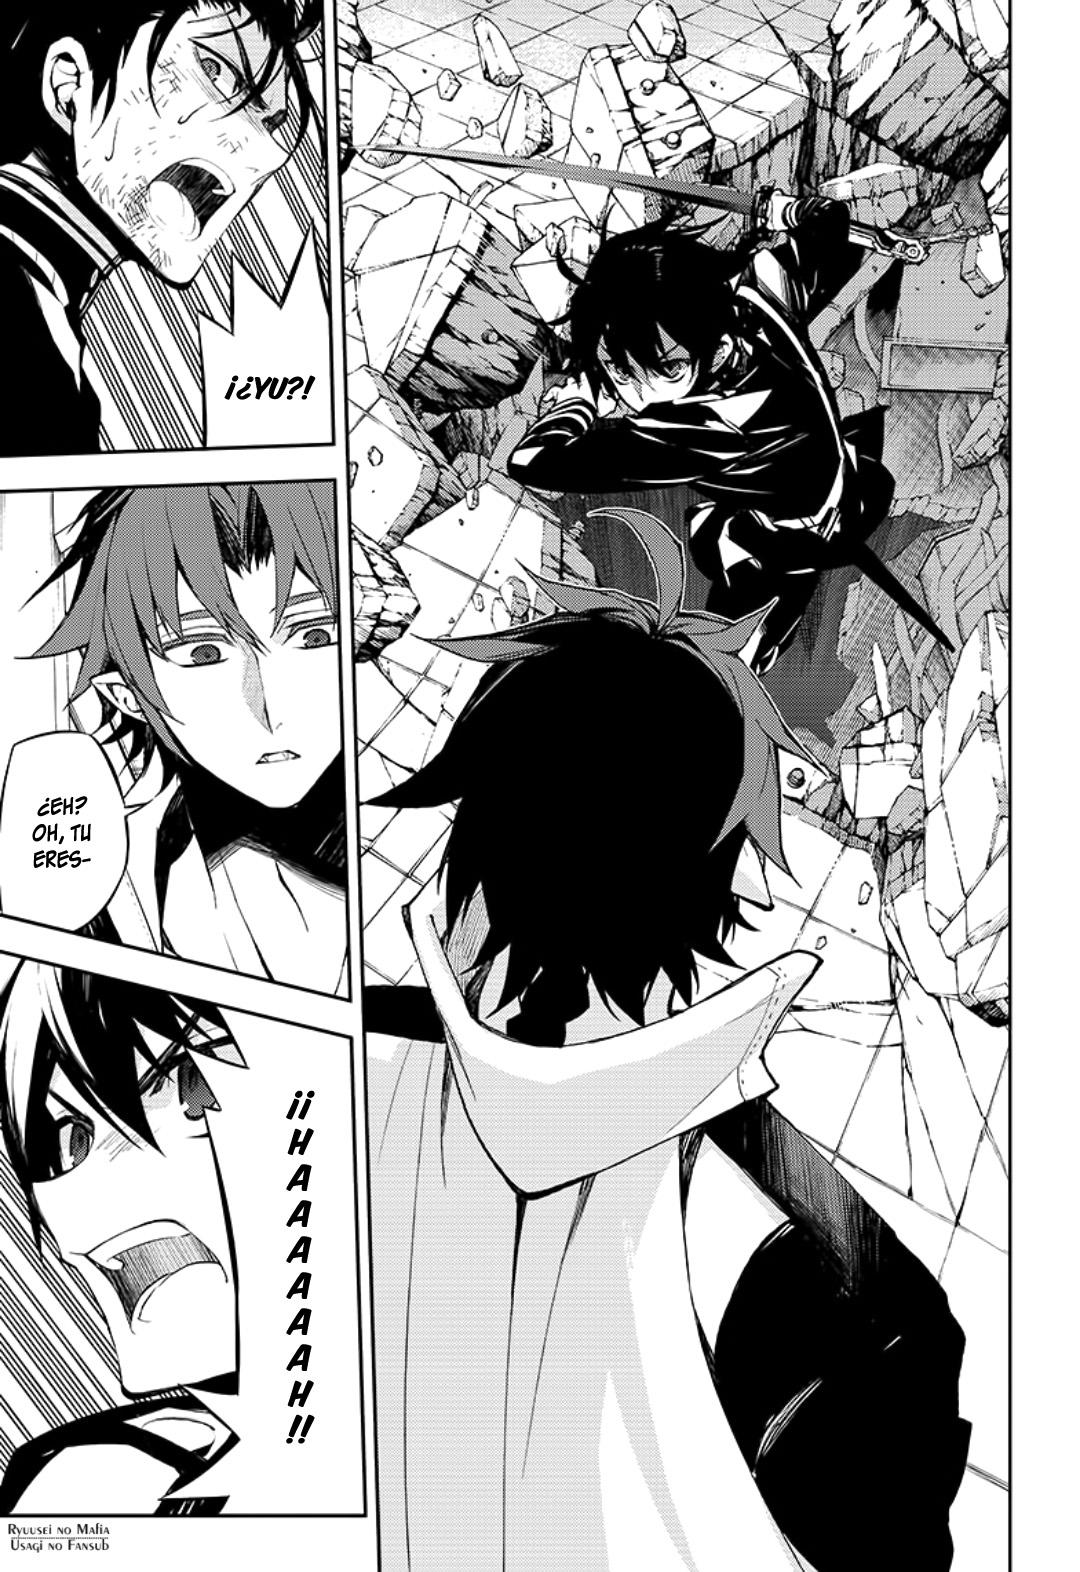 http://c5.ninemanga.com/es_manga/49/3057/381078/d6afc47d9260056bf6ebac5a4c908540.jpg Page 5